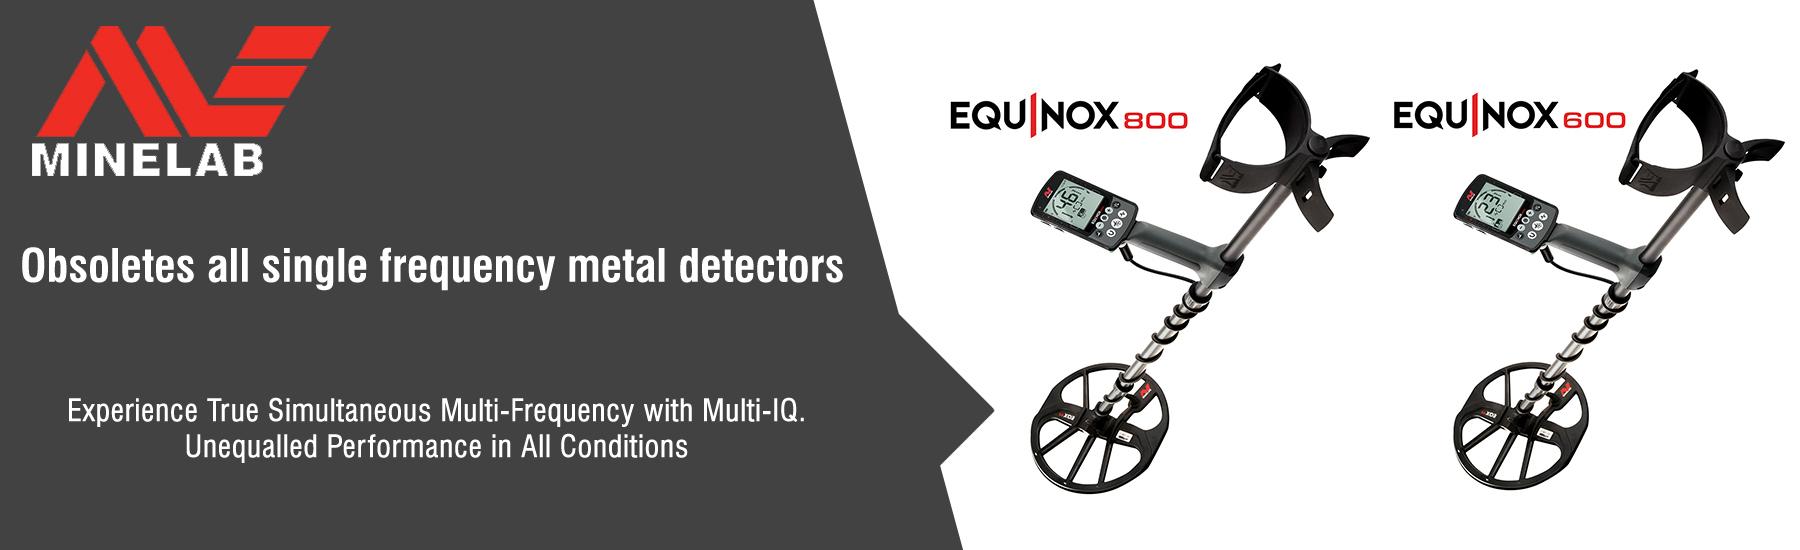 minelab-equinox-multi-iq